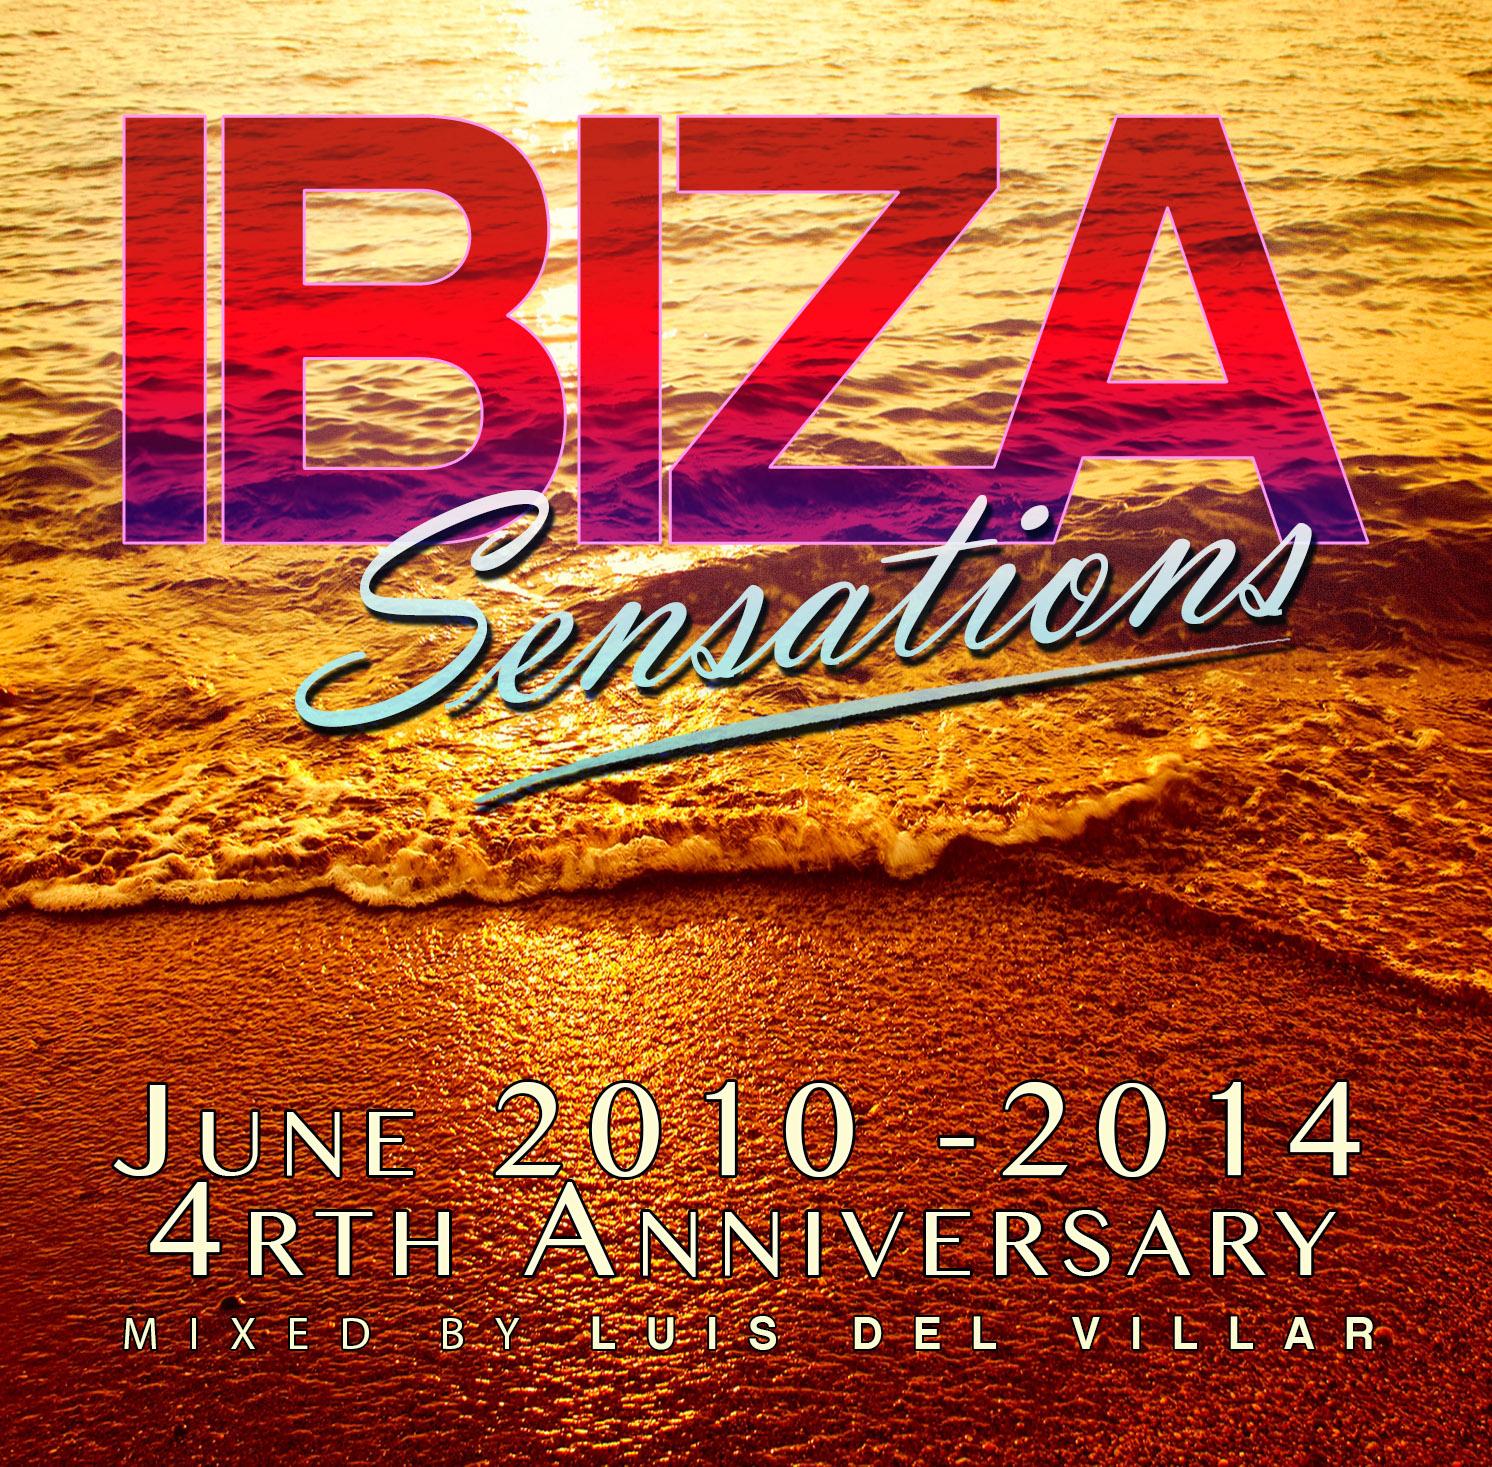 Artwork for Ibiza Sensations 96